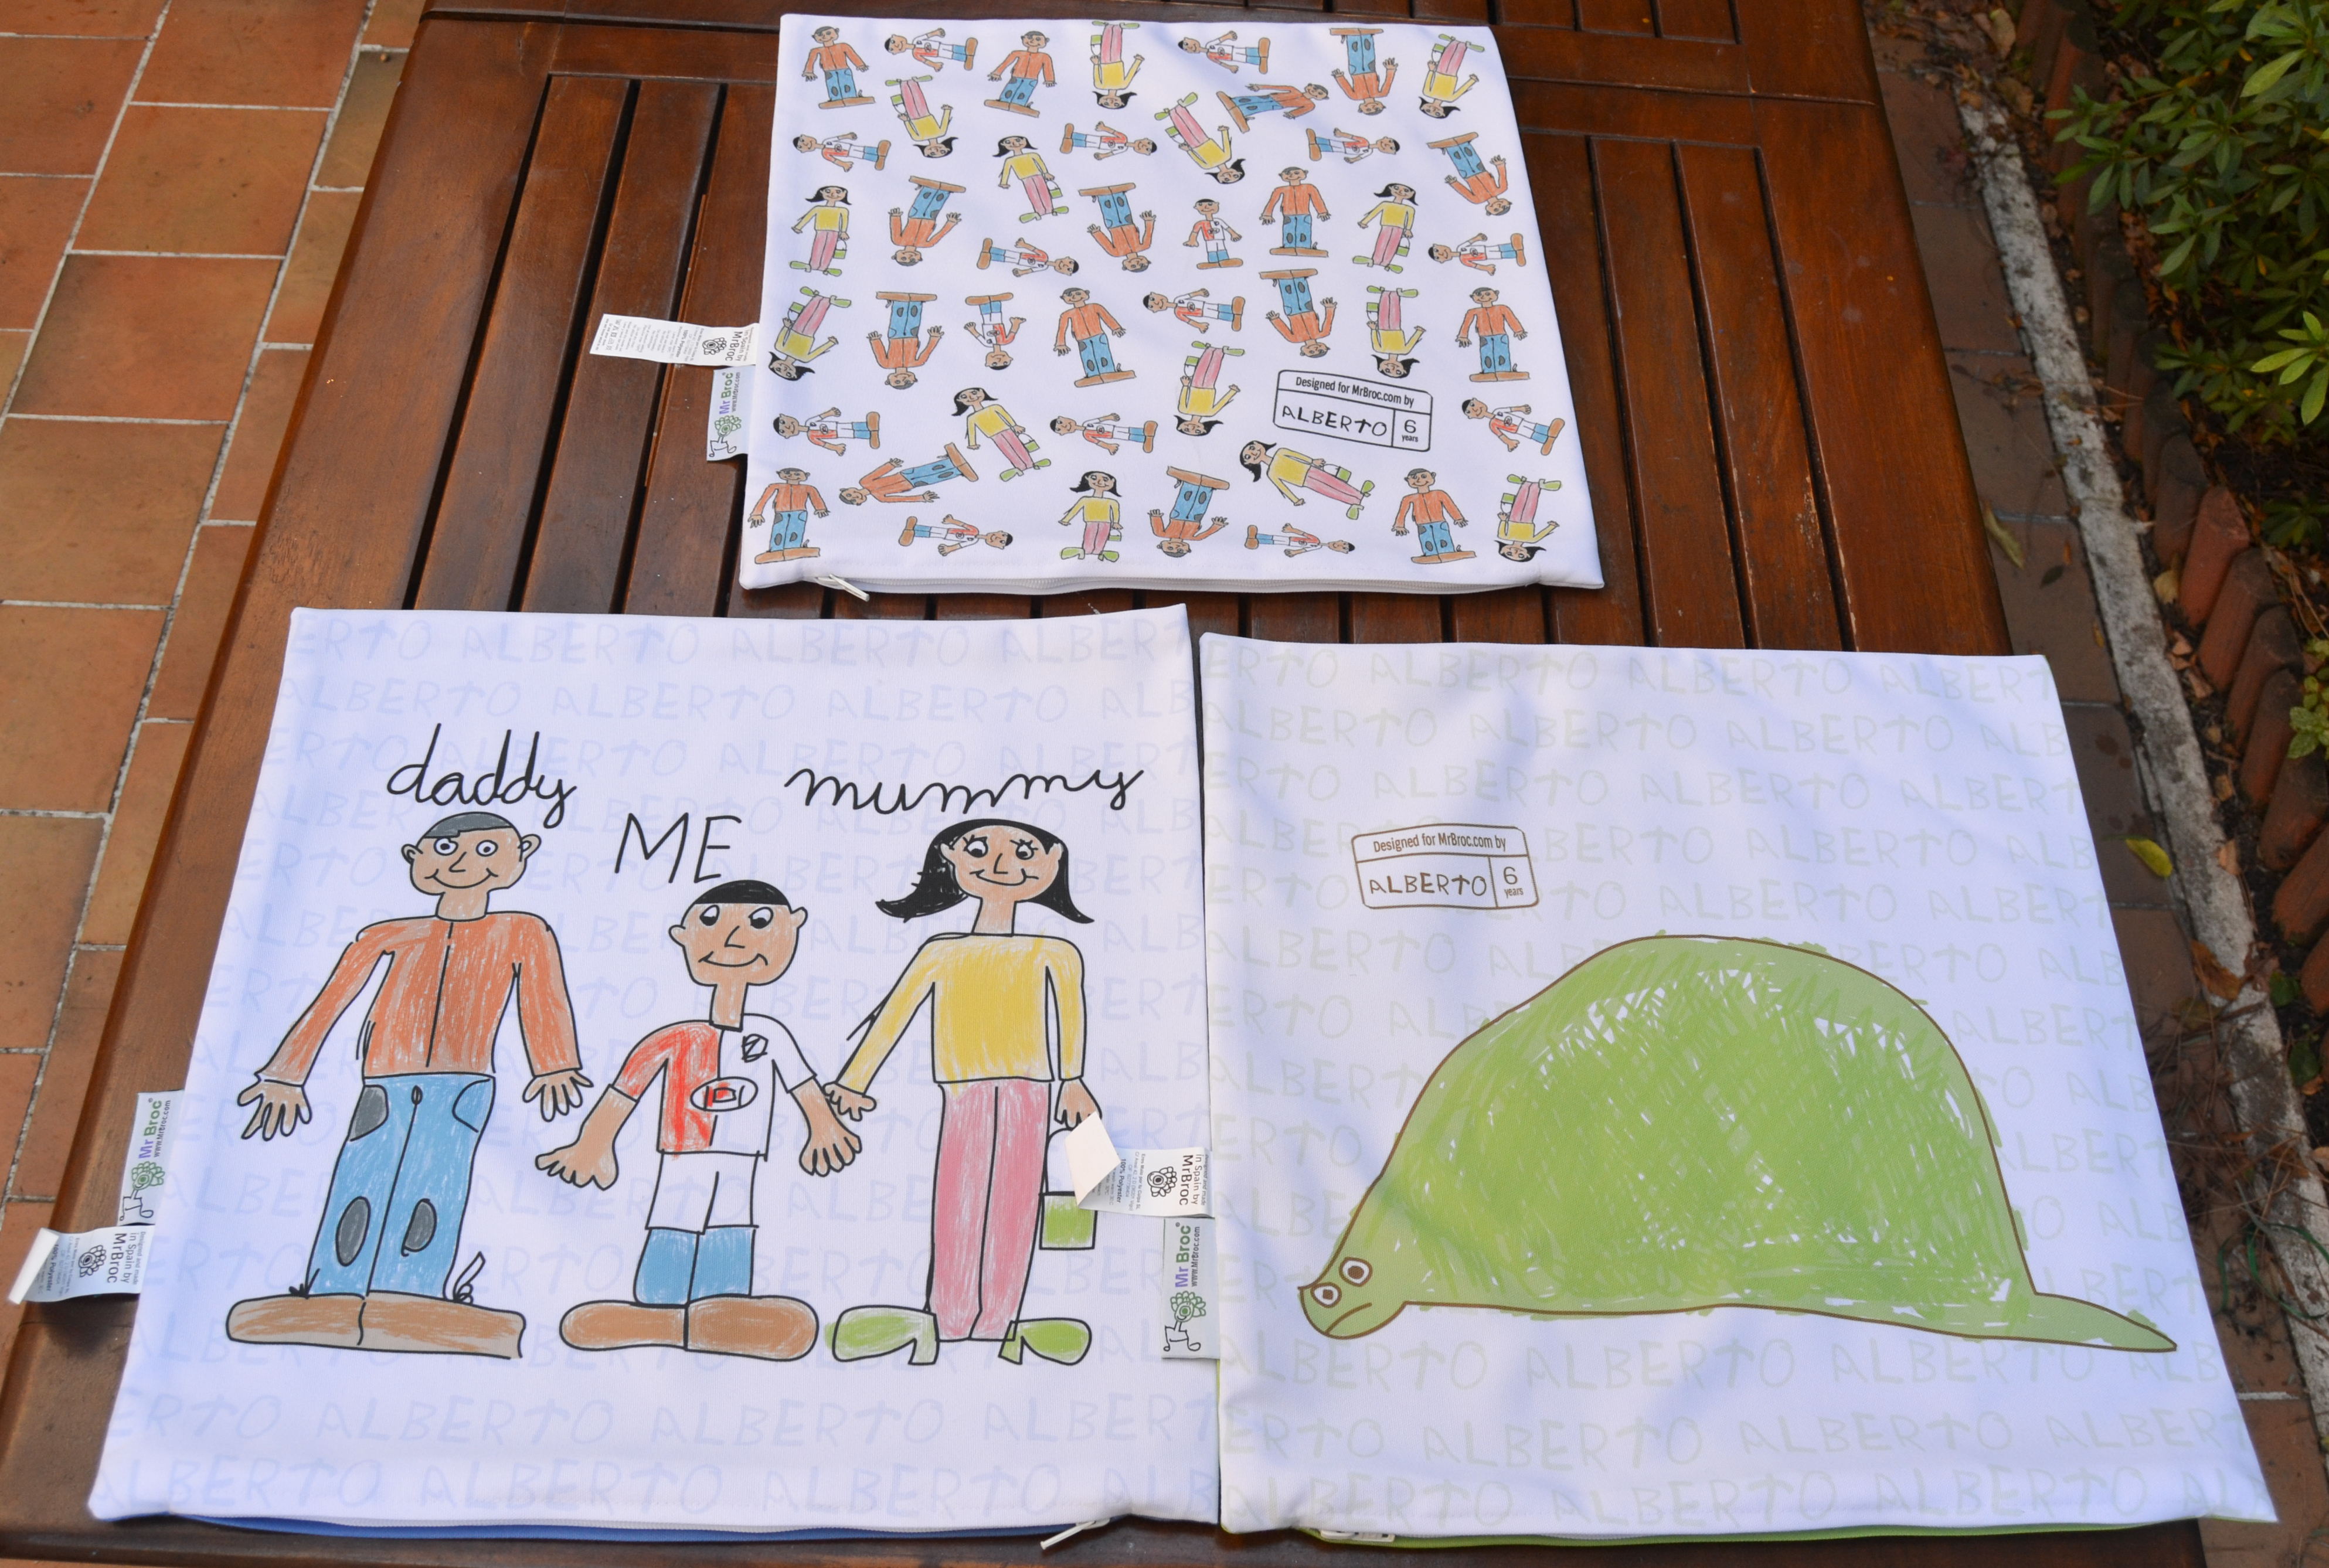 Cojines con dibujos de la familia MrBroc